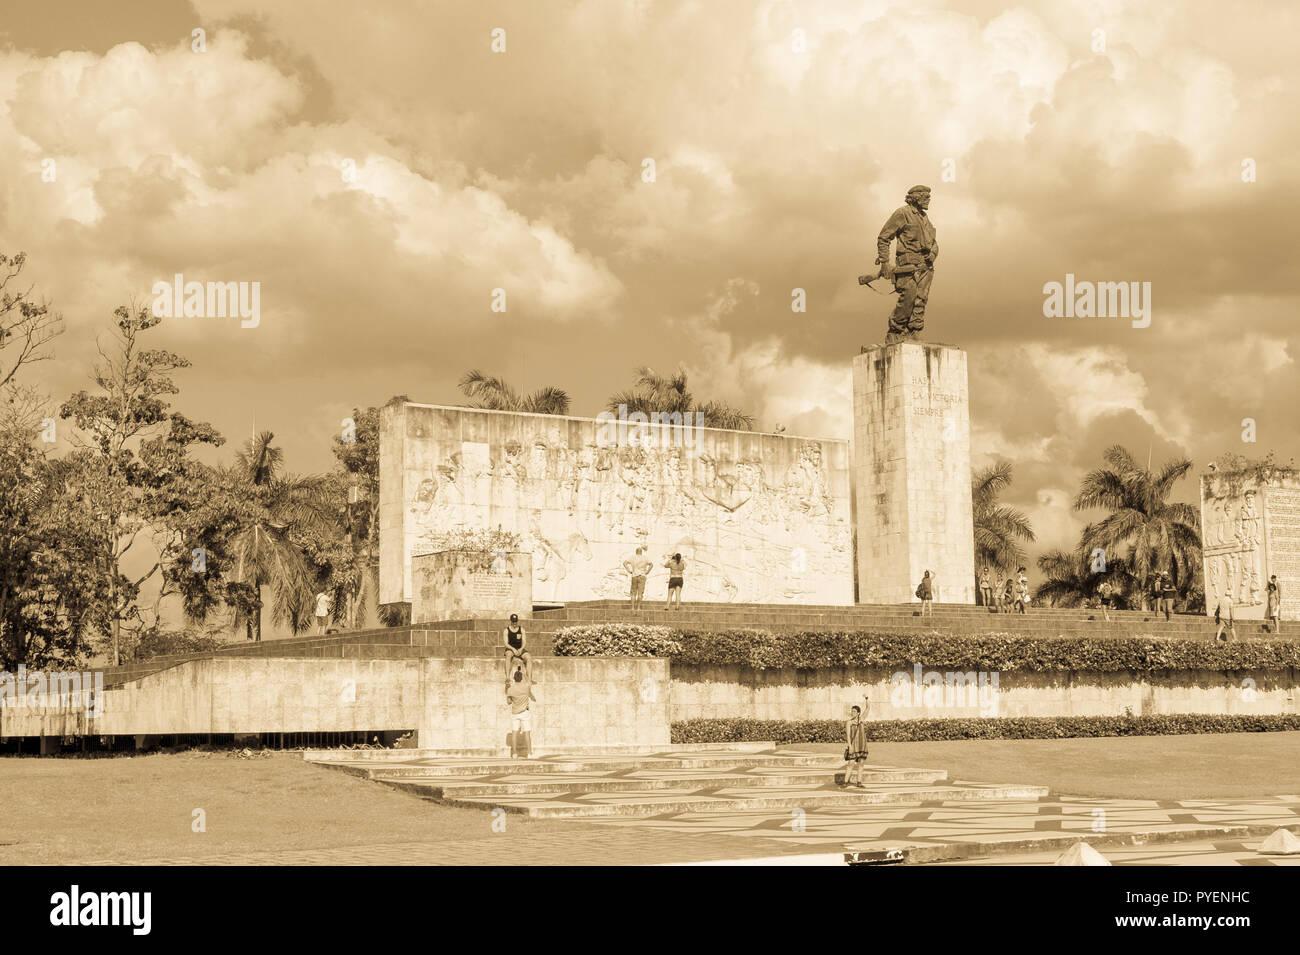 SANTA CLARA, CUBA-JANUARY 6, 2017: Che Guevara Memorial and Museum in Santa clara. Che Guevara was a commander in the Rebel Army who overthrew Batista - Stock Image